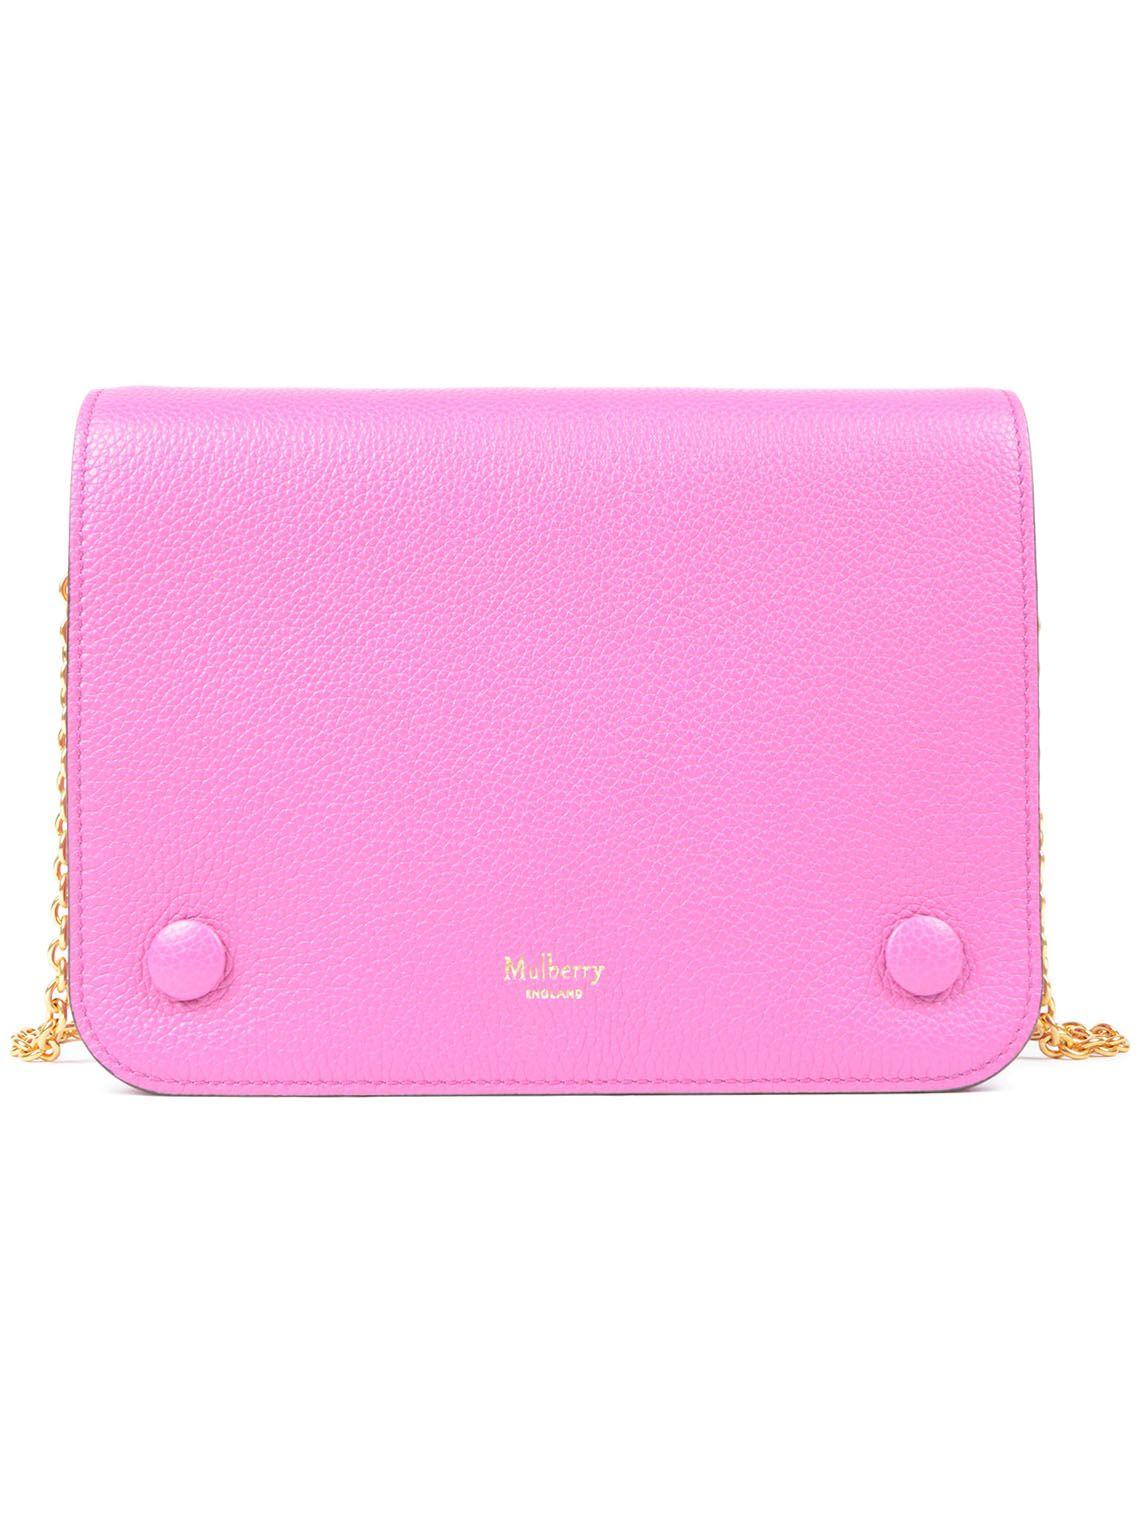 Mulberry Mini Classic Shoulder Bag